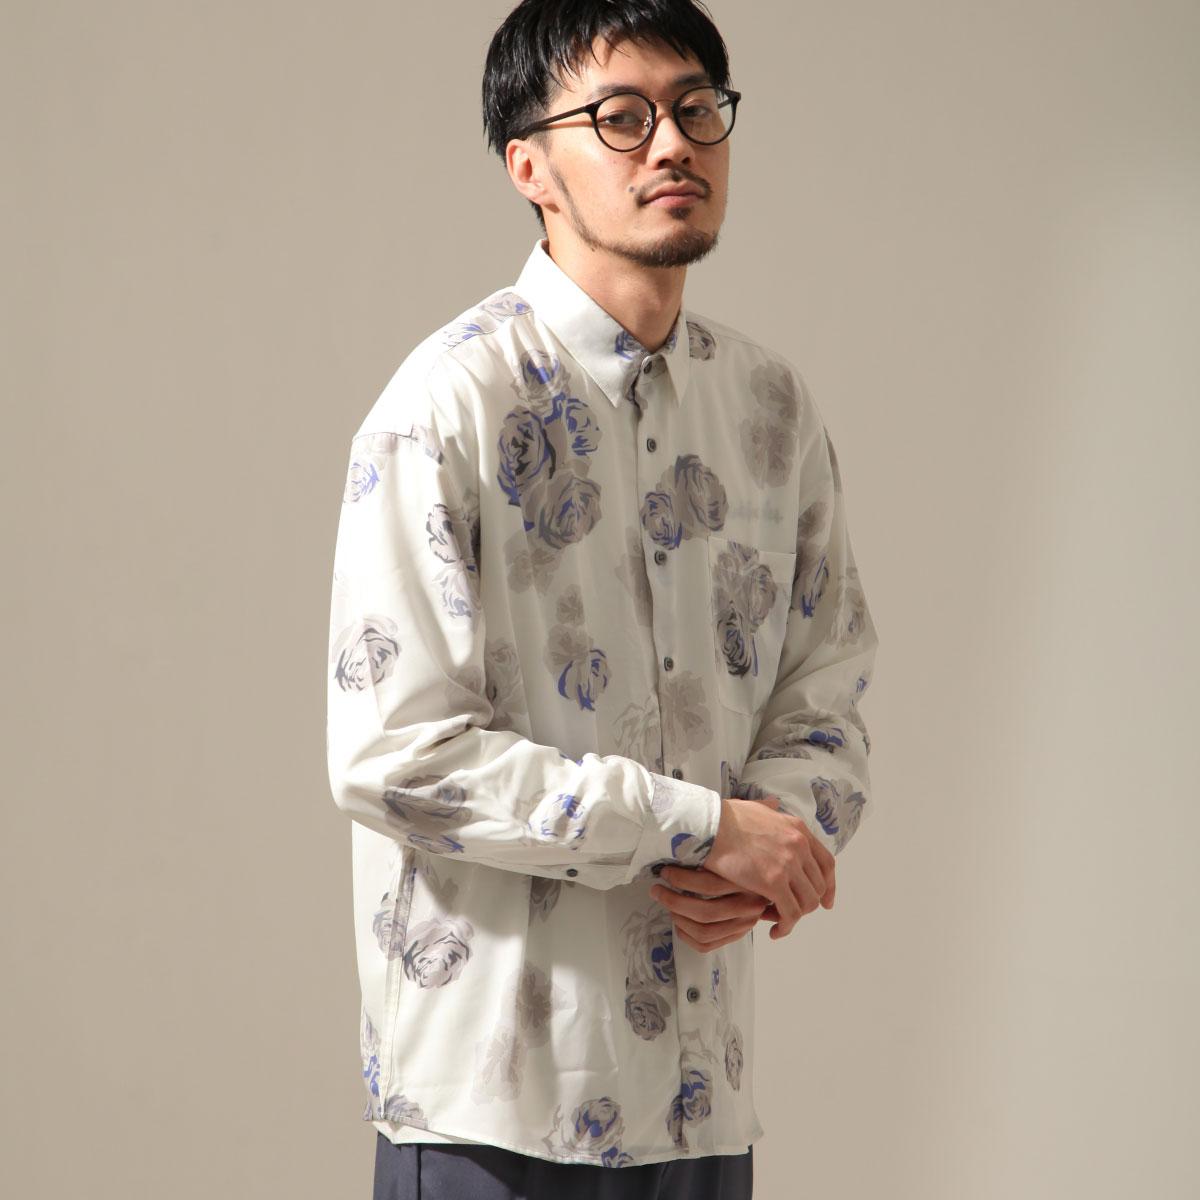 【New】ZIP 寬版長袖襯衫 花朵設計 1